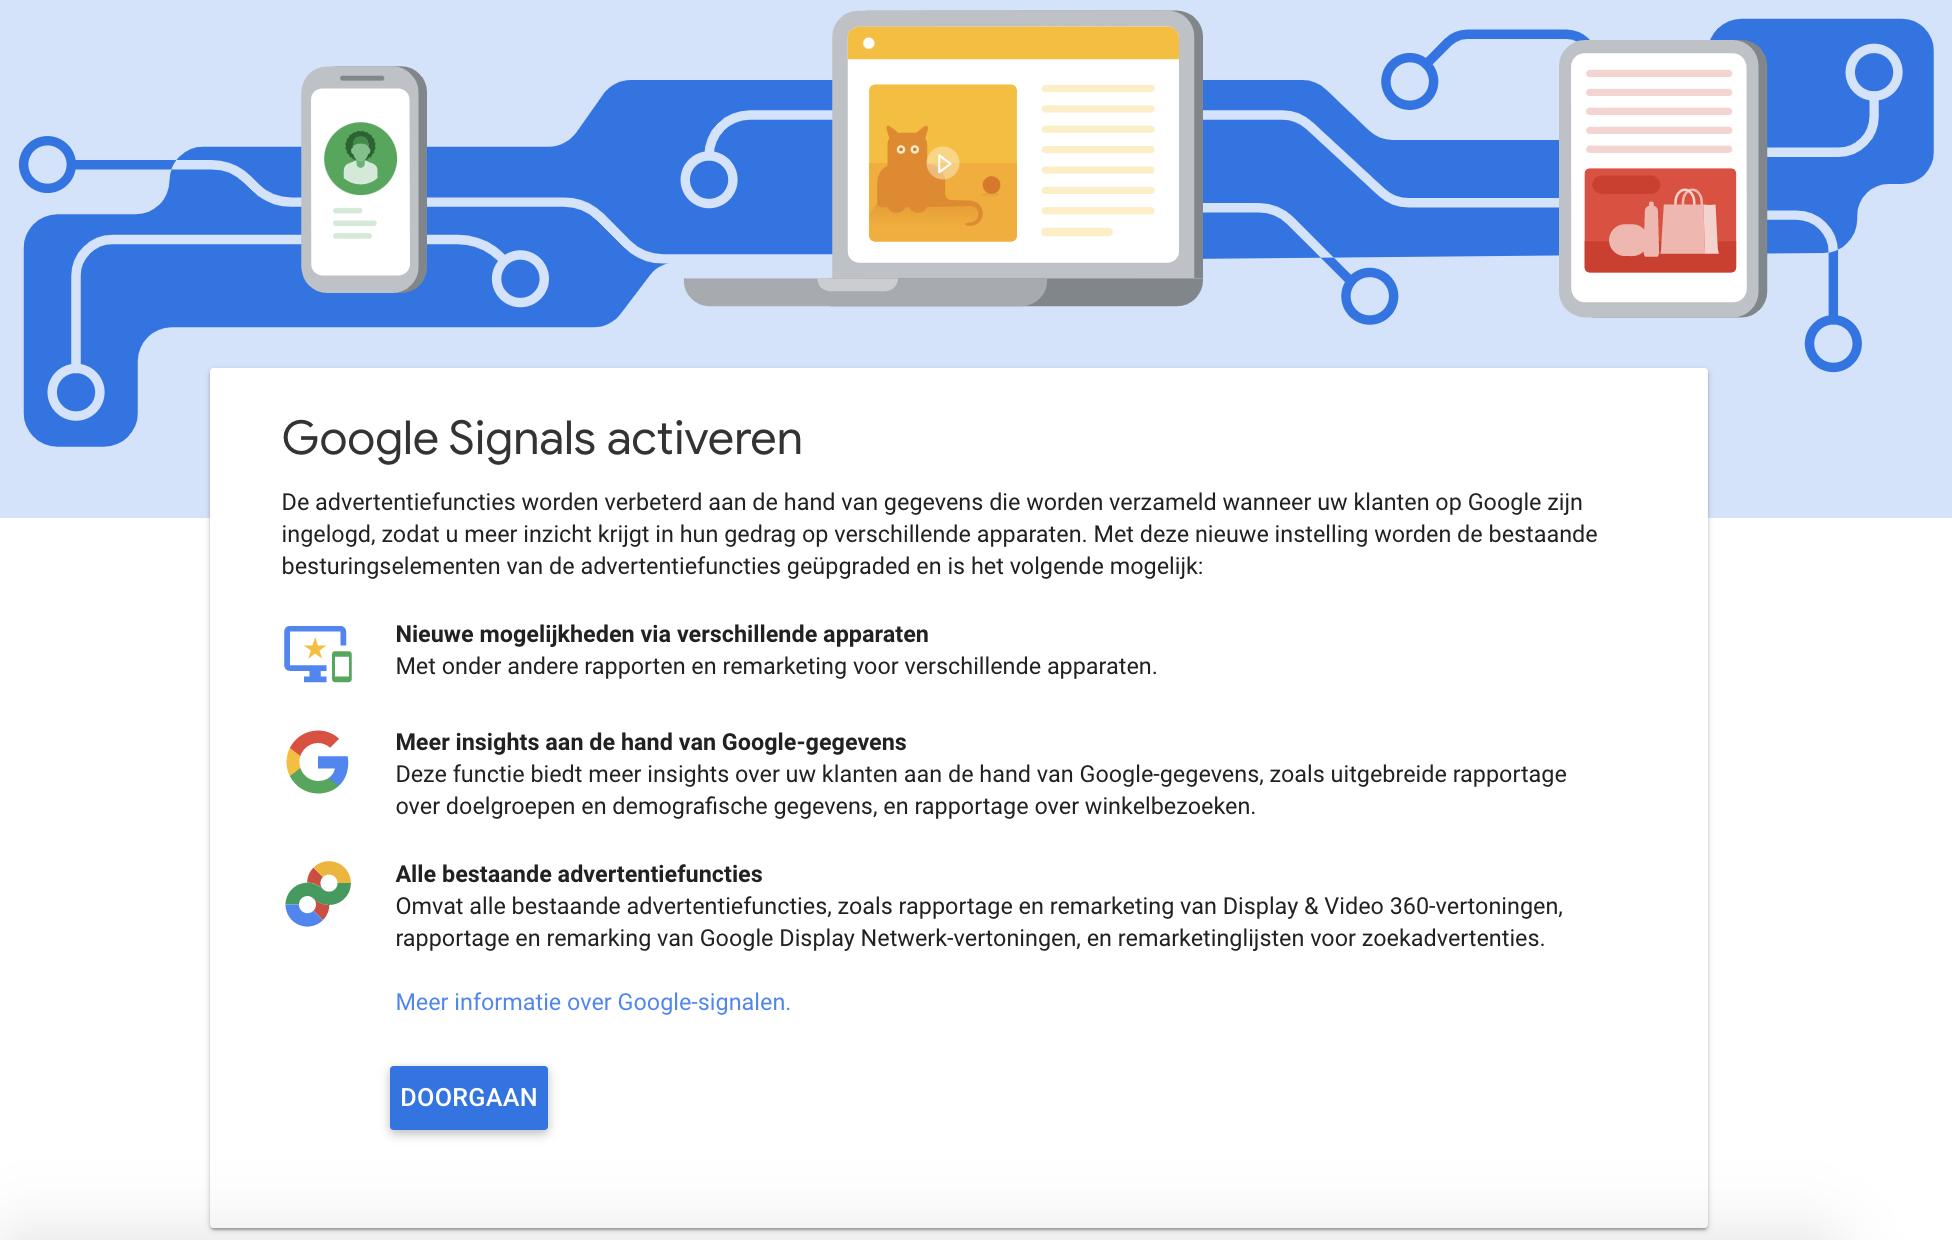 Google Signals activeren